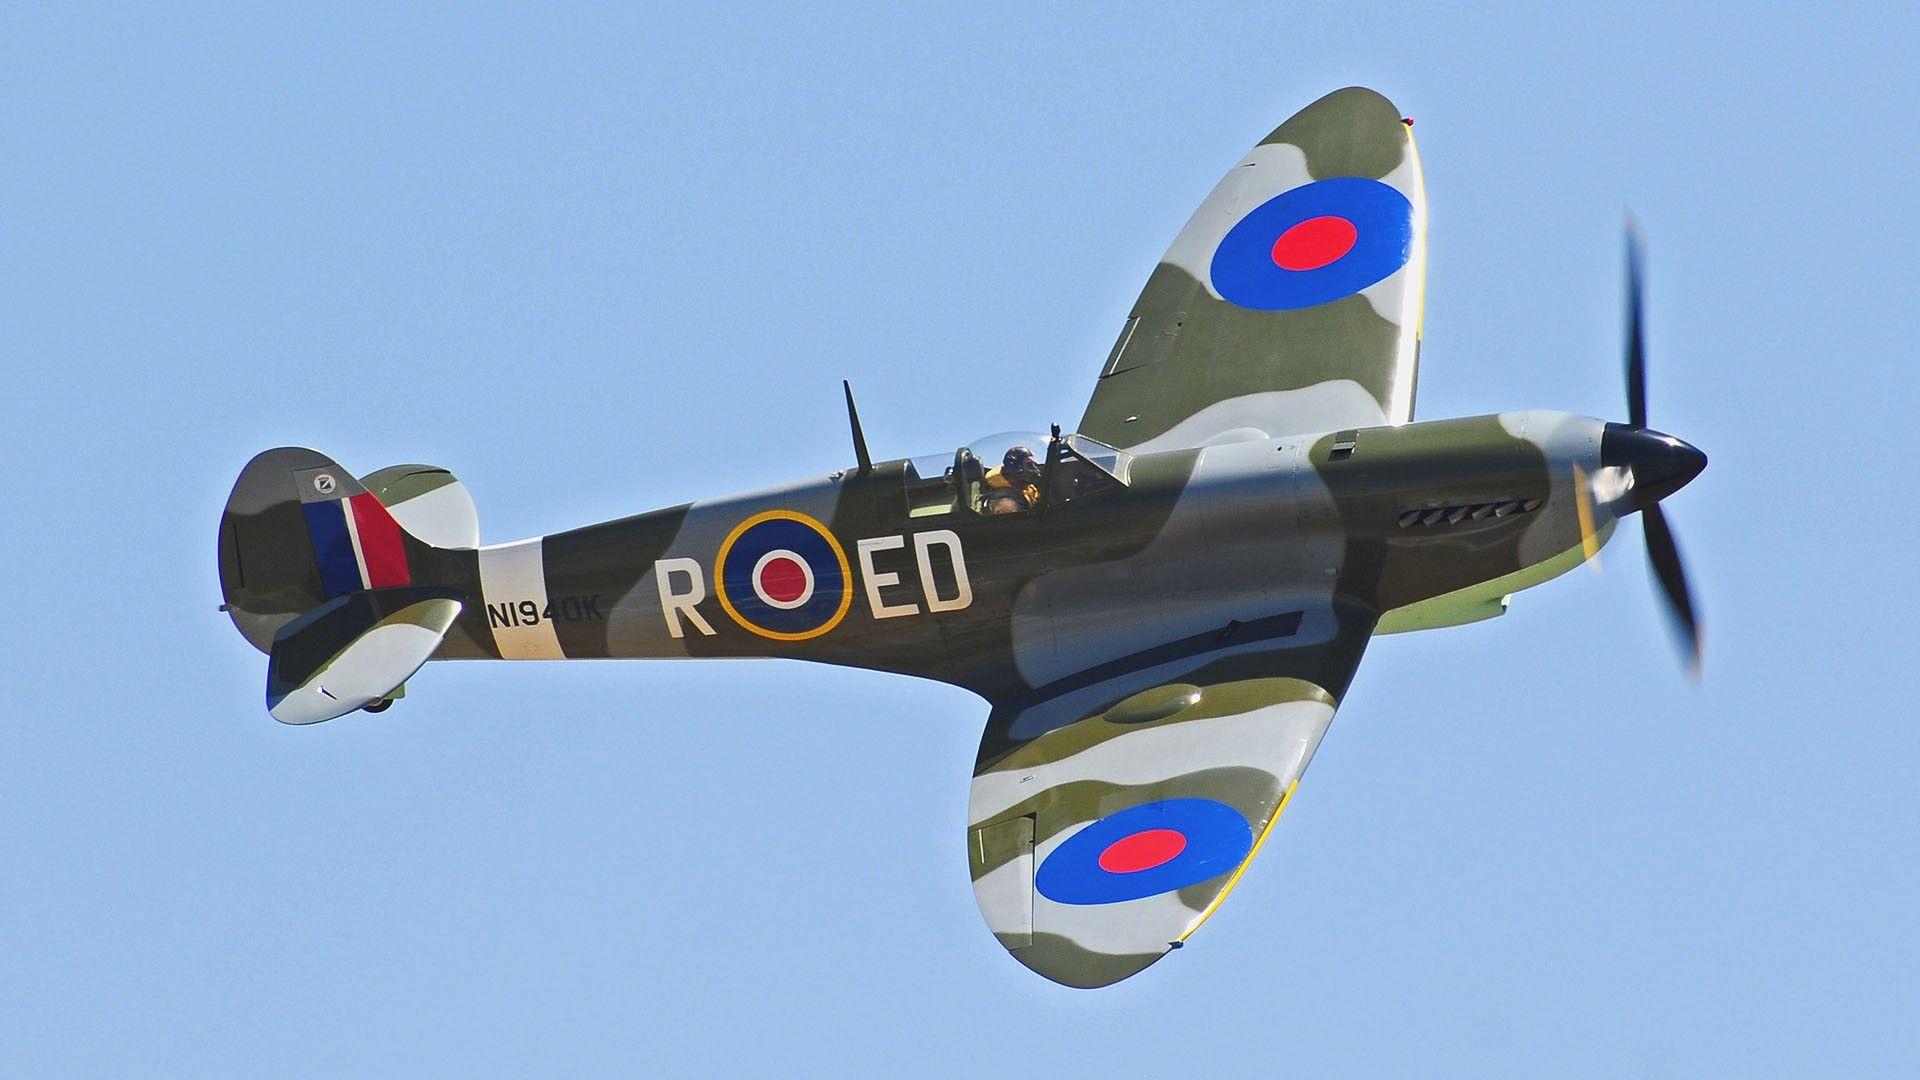 HD Quality World War 2 WWII Aircraft Wallpaper HD 19 ...  HD Quality Worl...